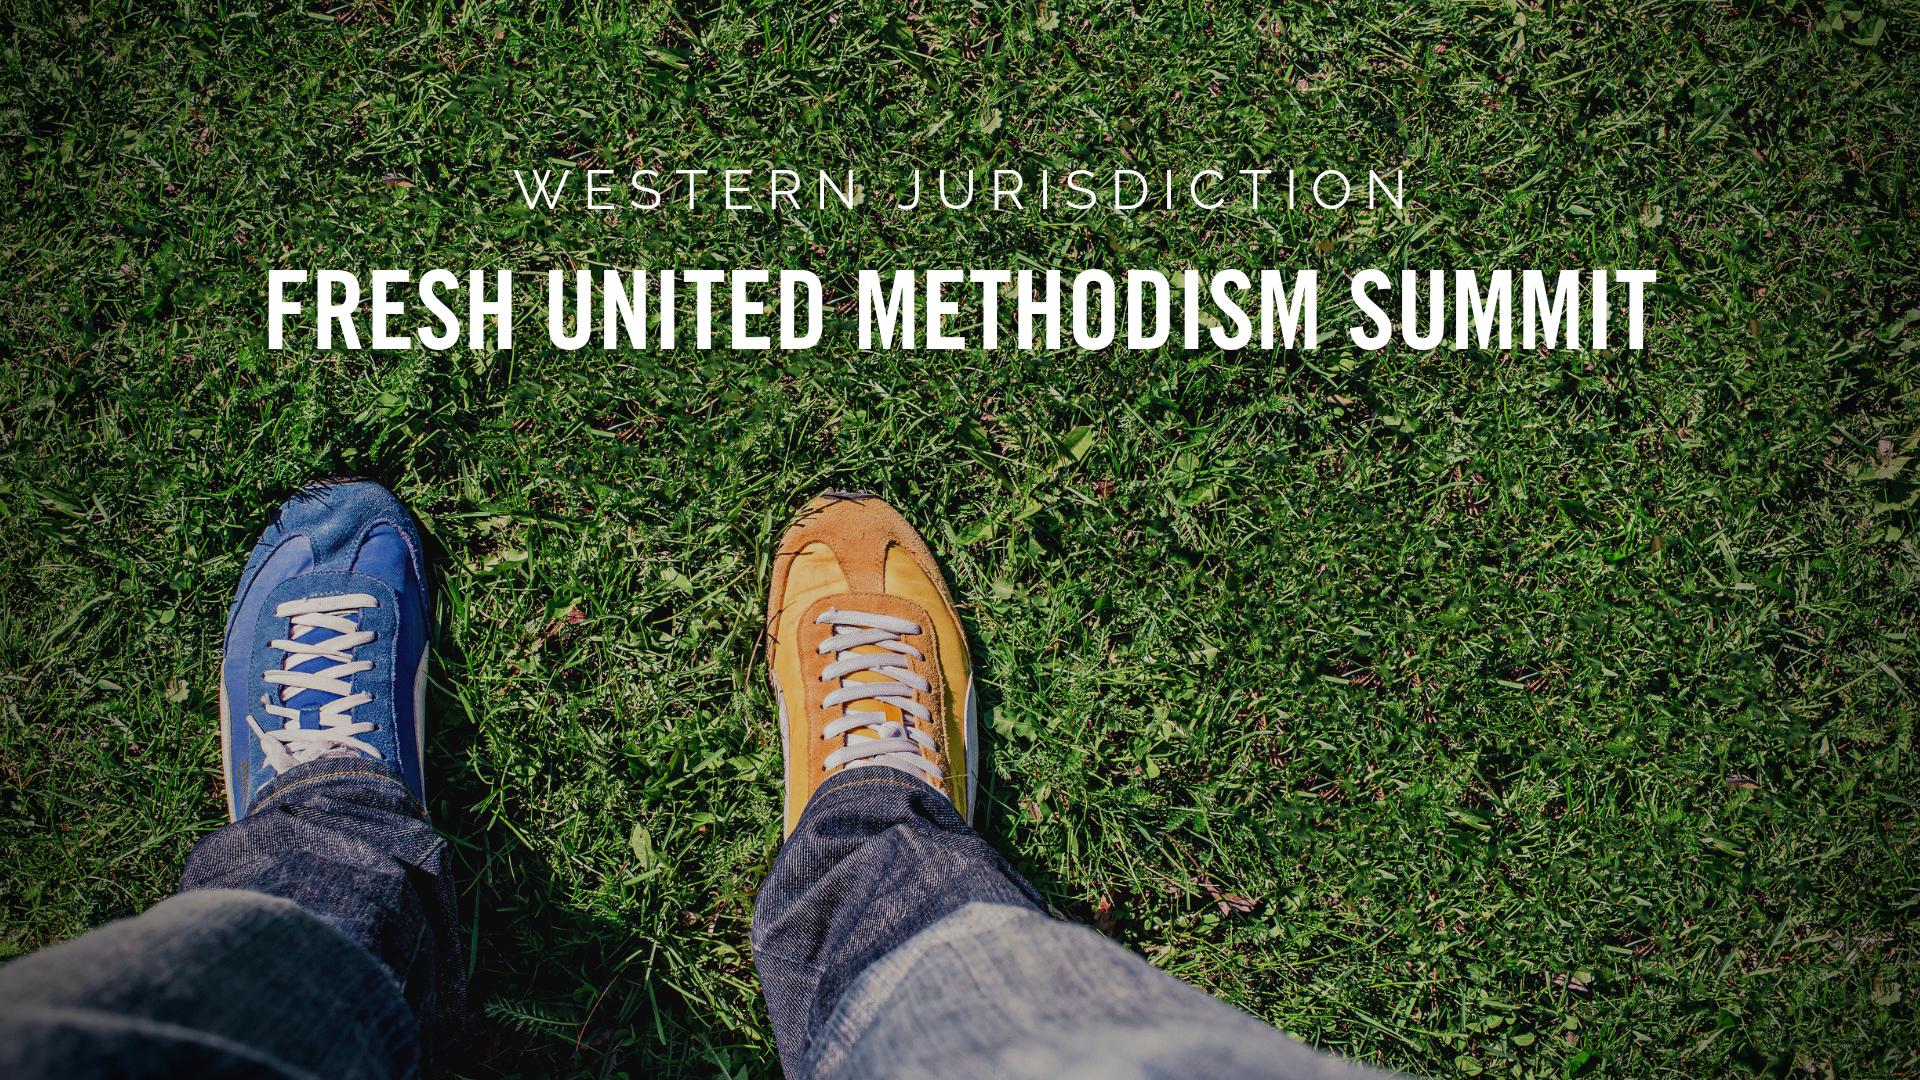 Graphic for Western Jurisdiction Fresh United Methodism Summit